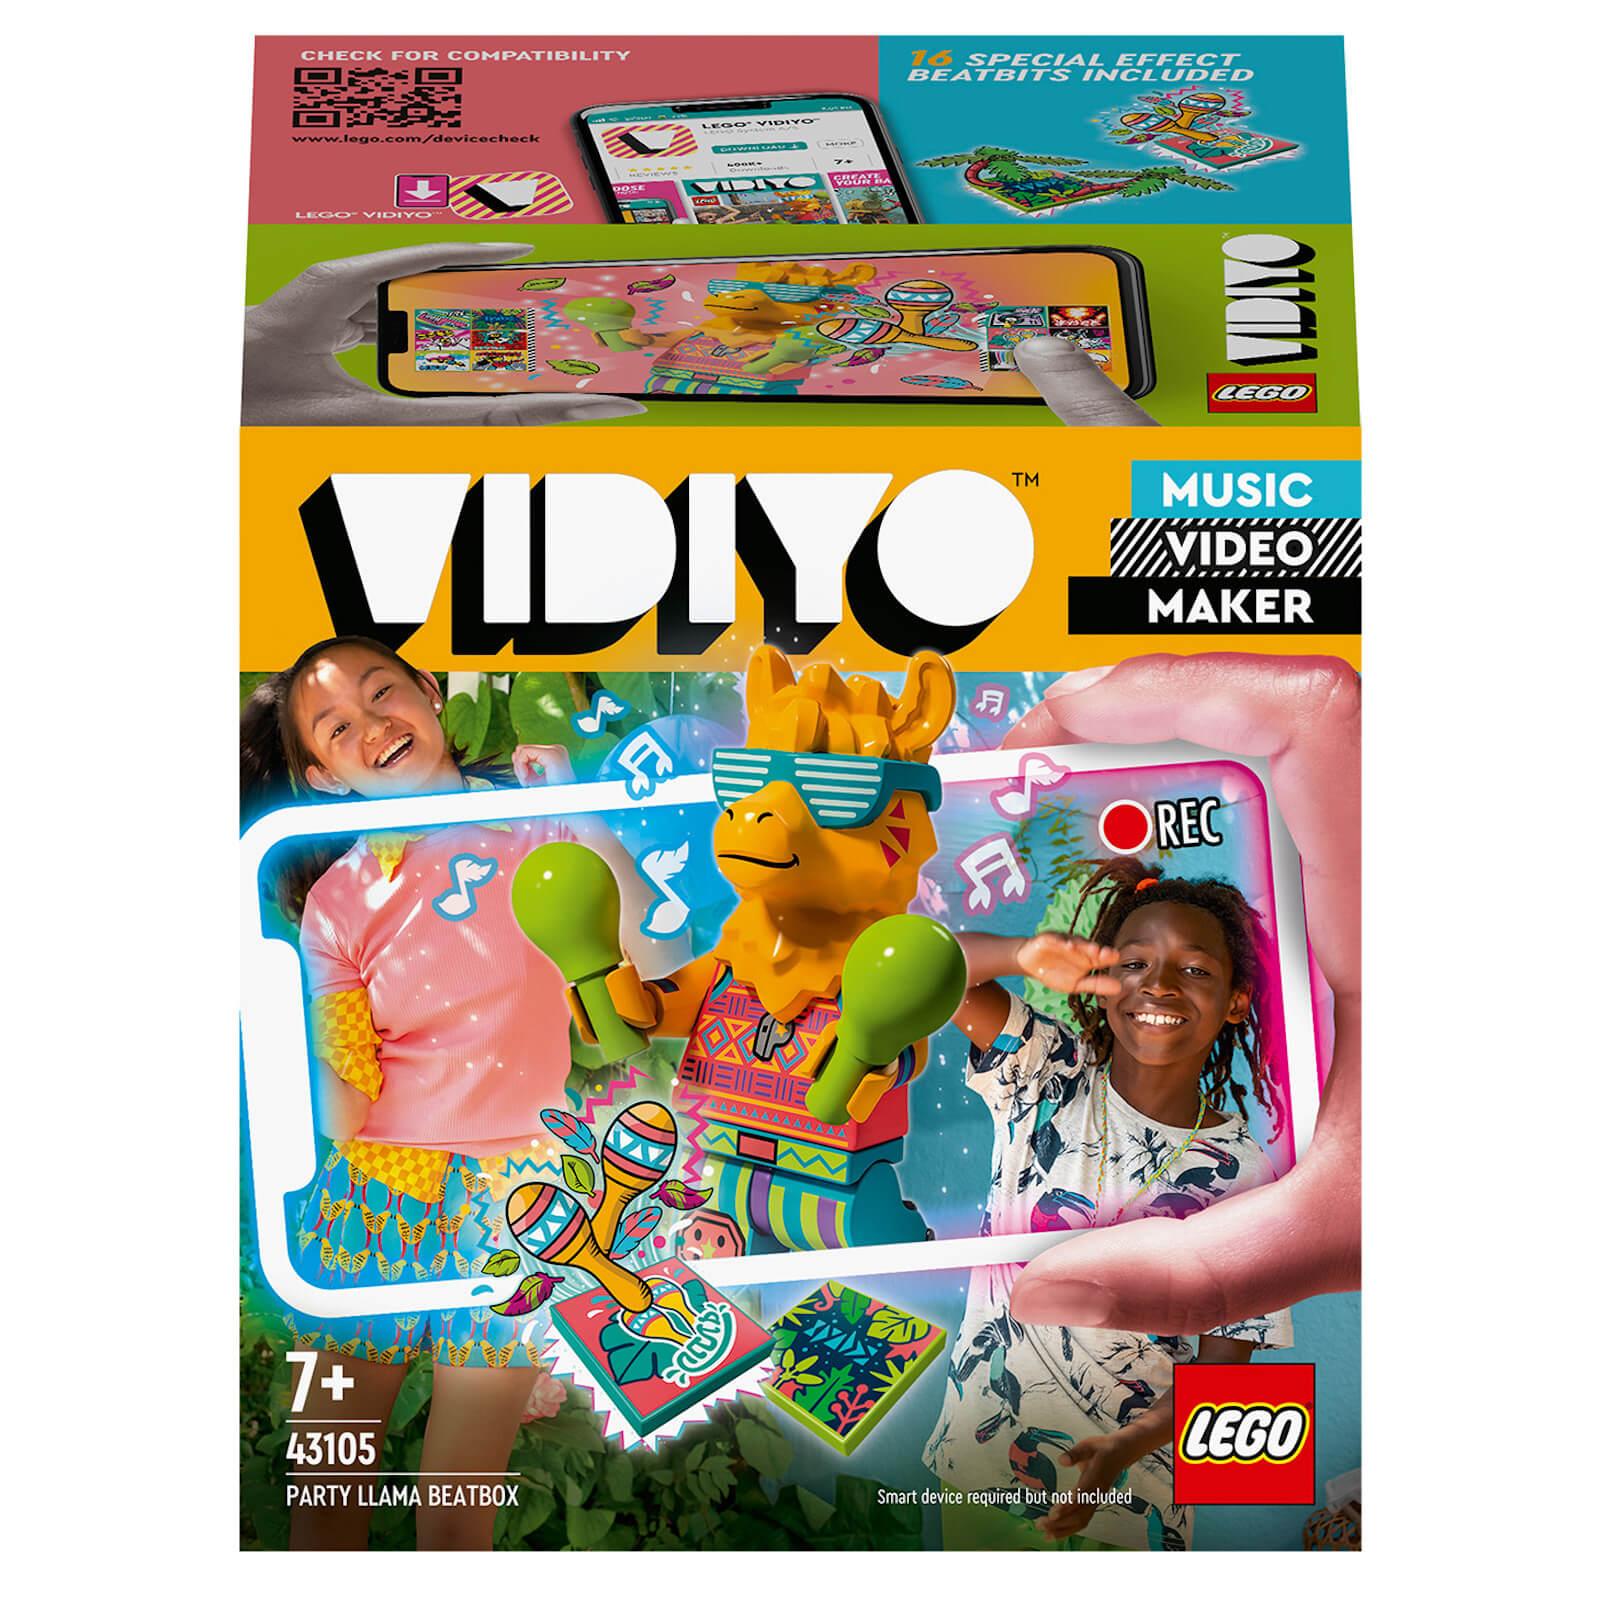 LEGO VIDIYO: Party Llama BeatBox (43105)